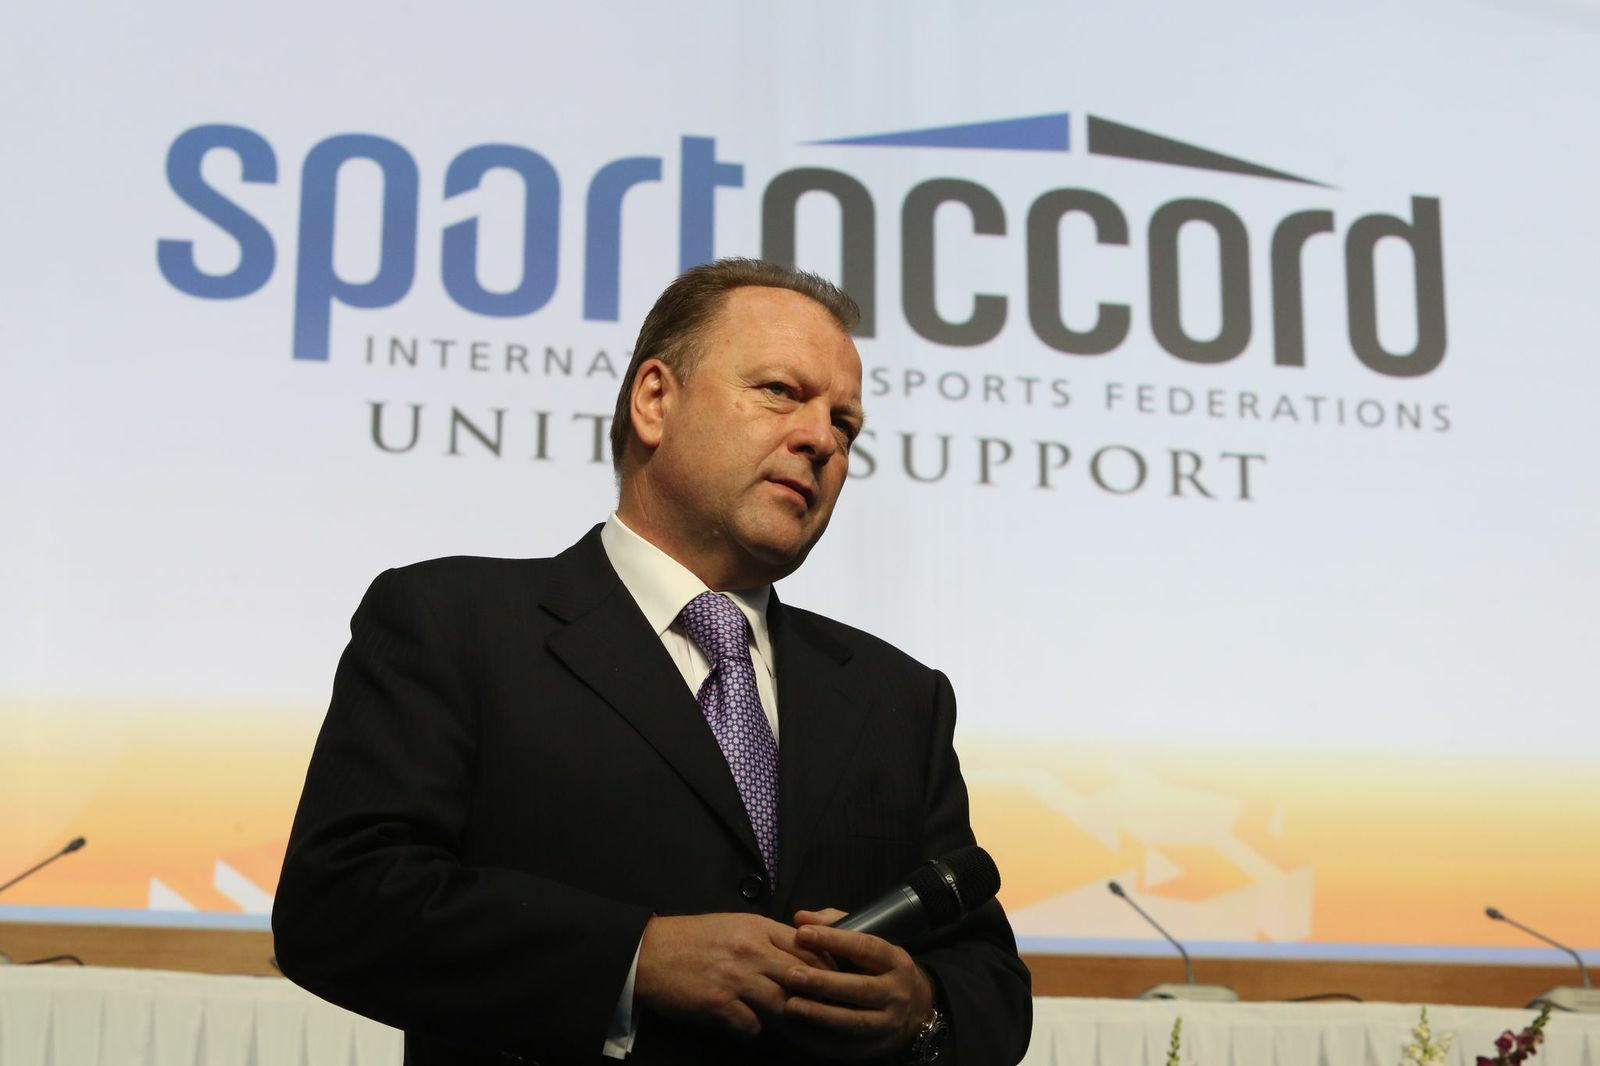 Marius Vizer, President of SportAccord